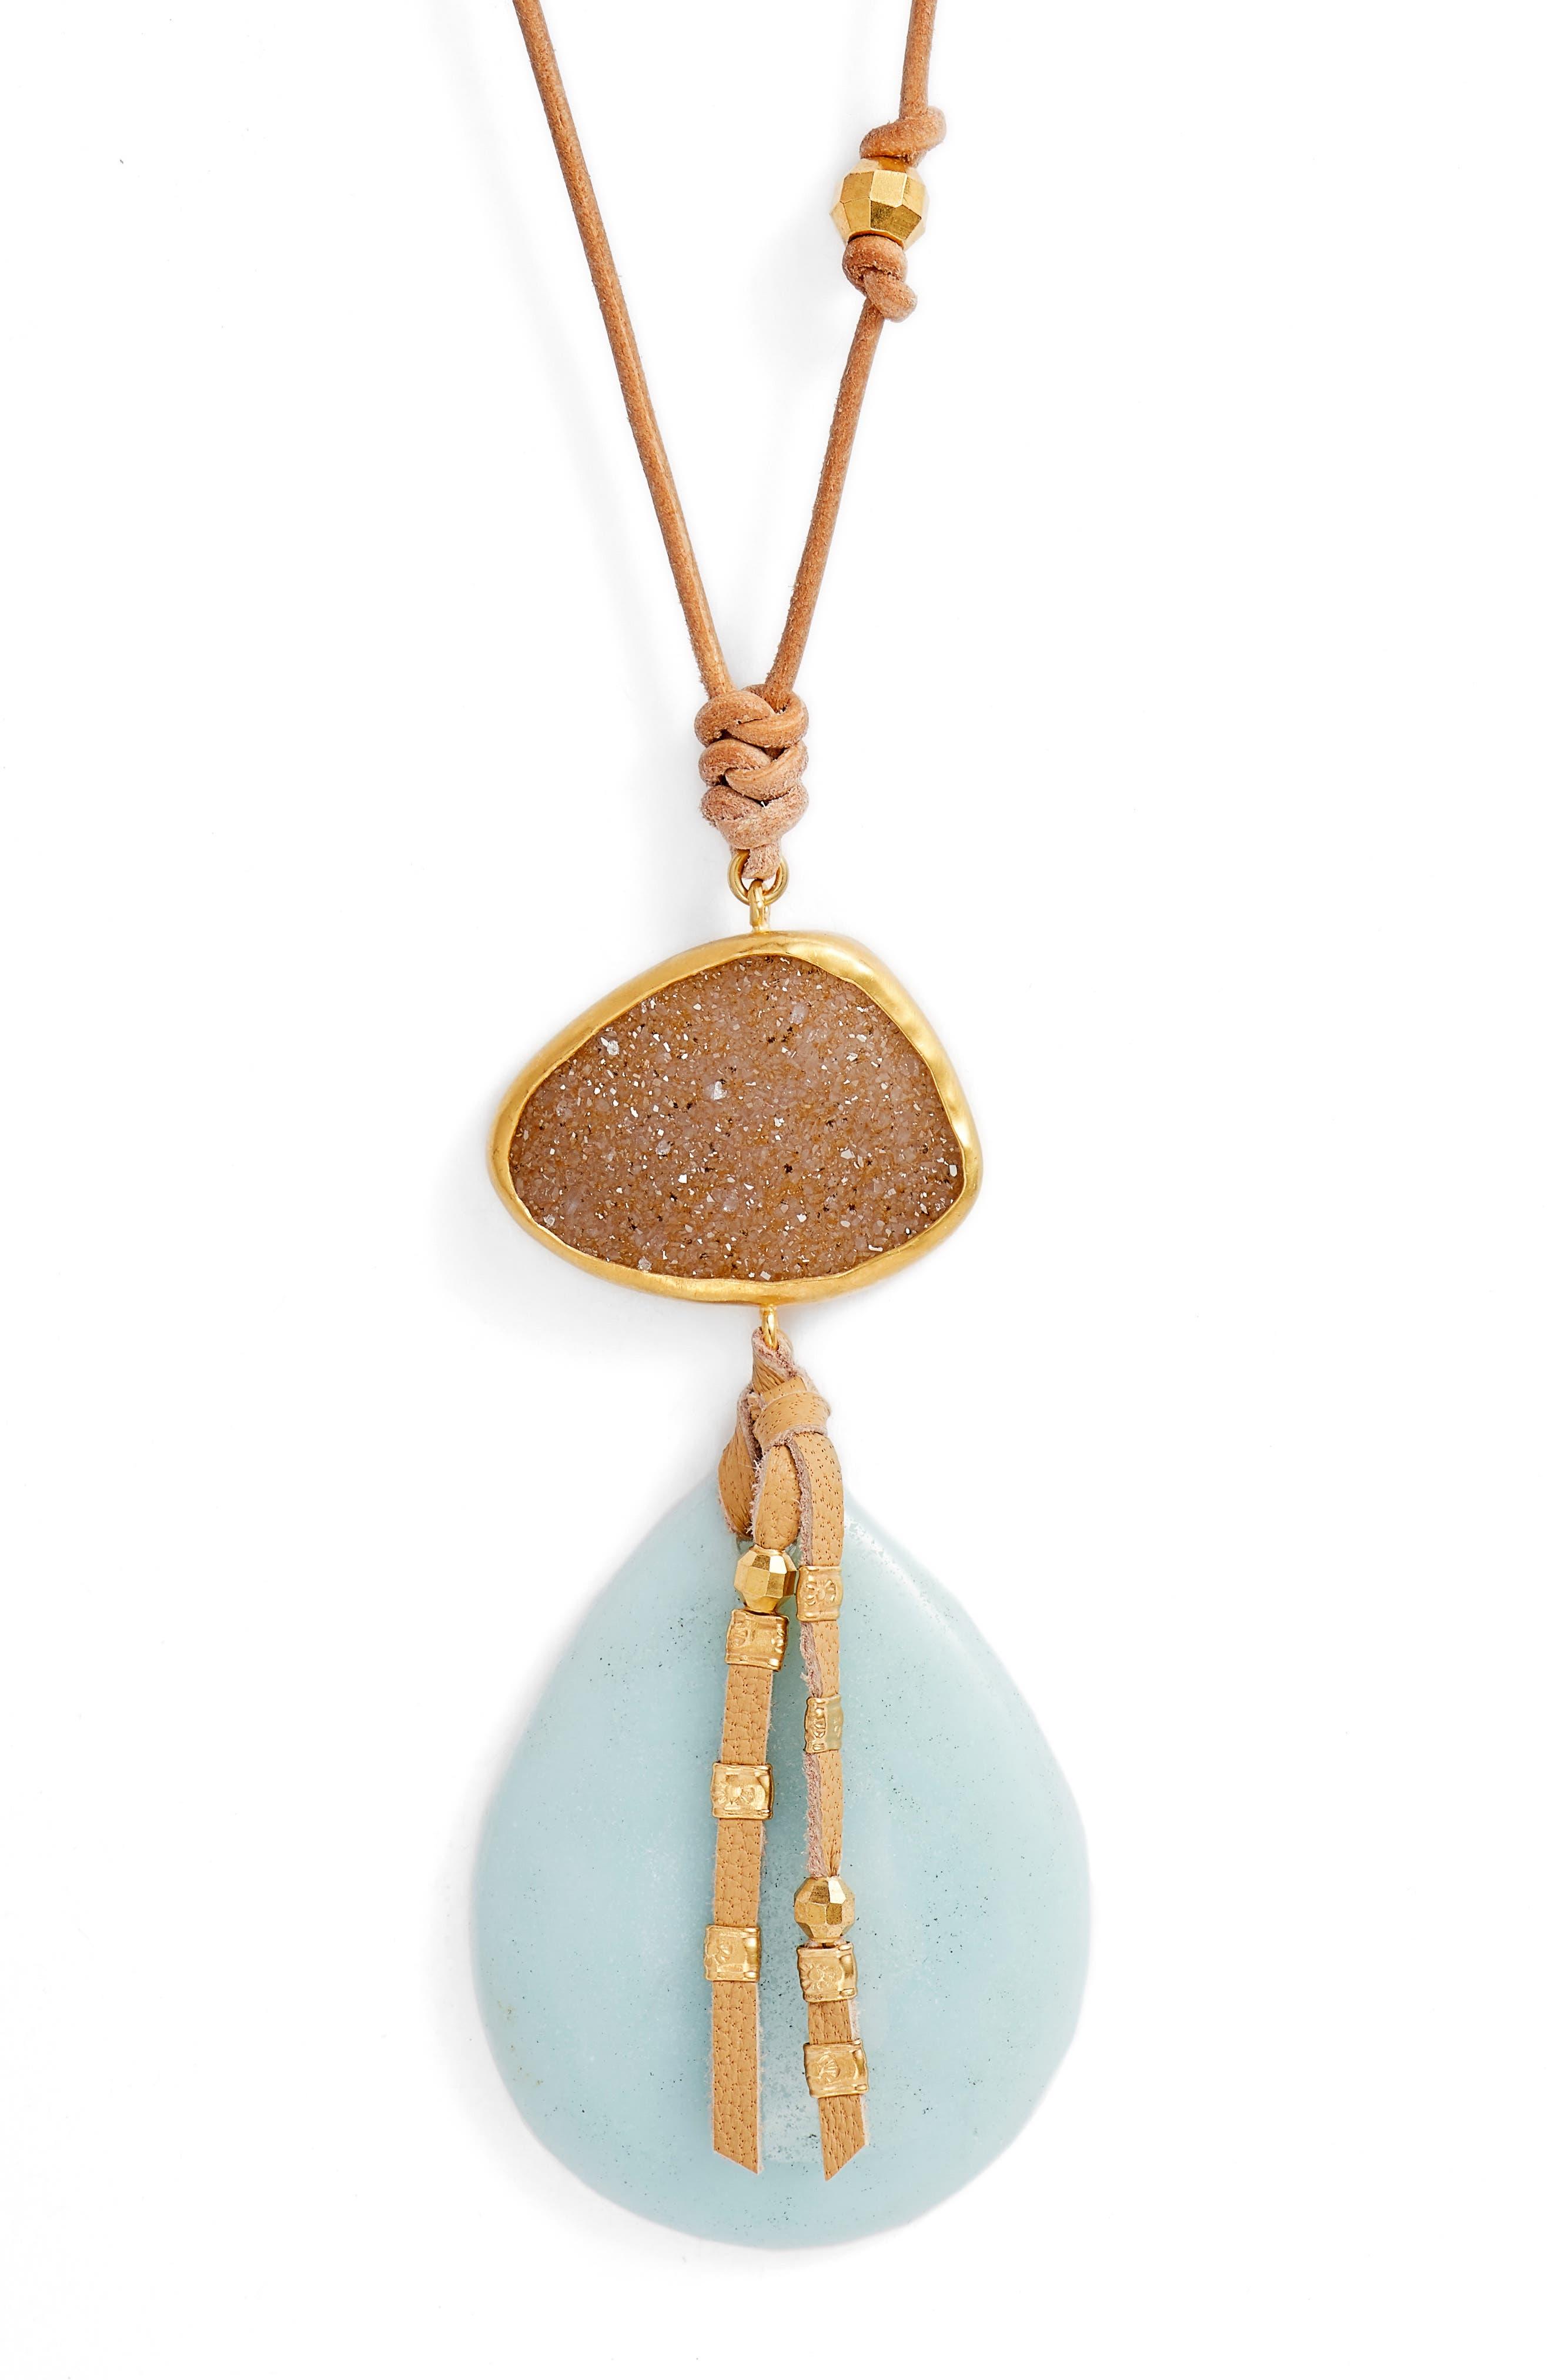 Amazonite Pendant Necklace,                             Alternate thumbnail 2, color,                             AMAZONITE